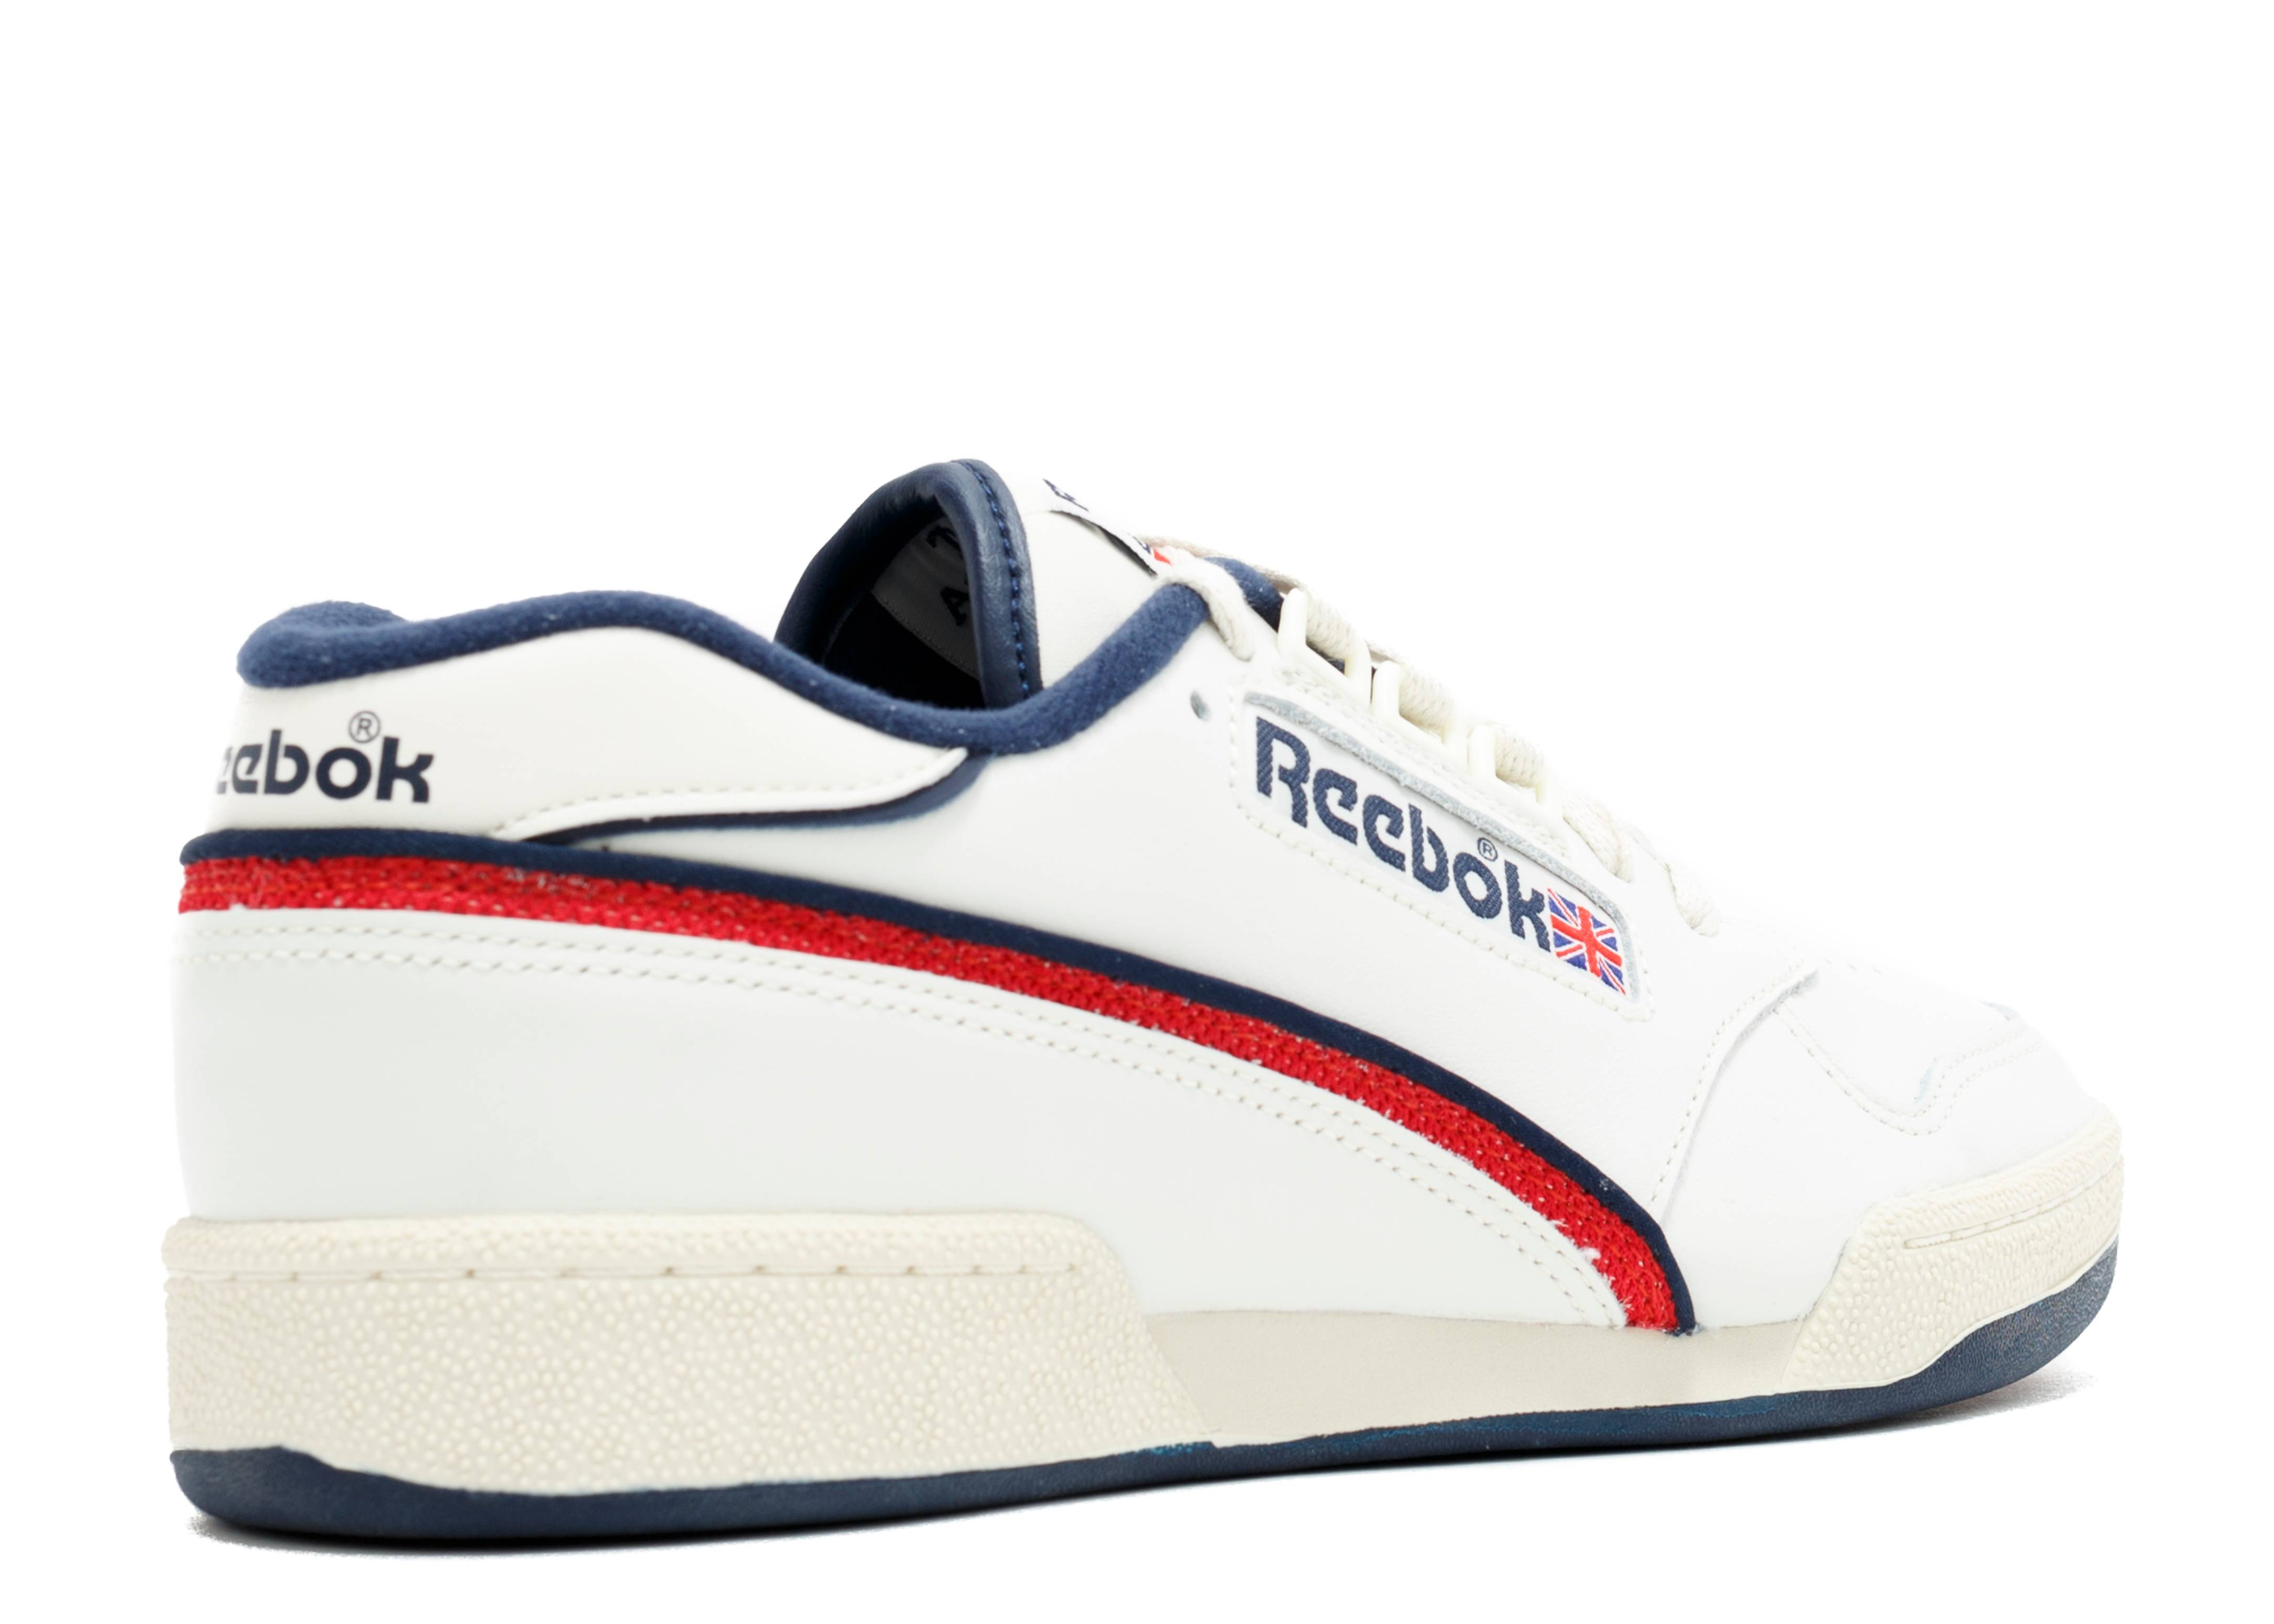 reebok act 600